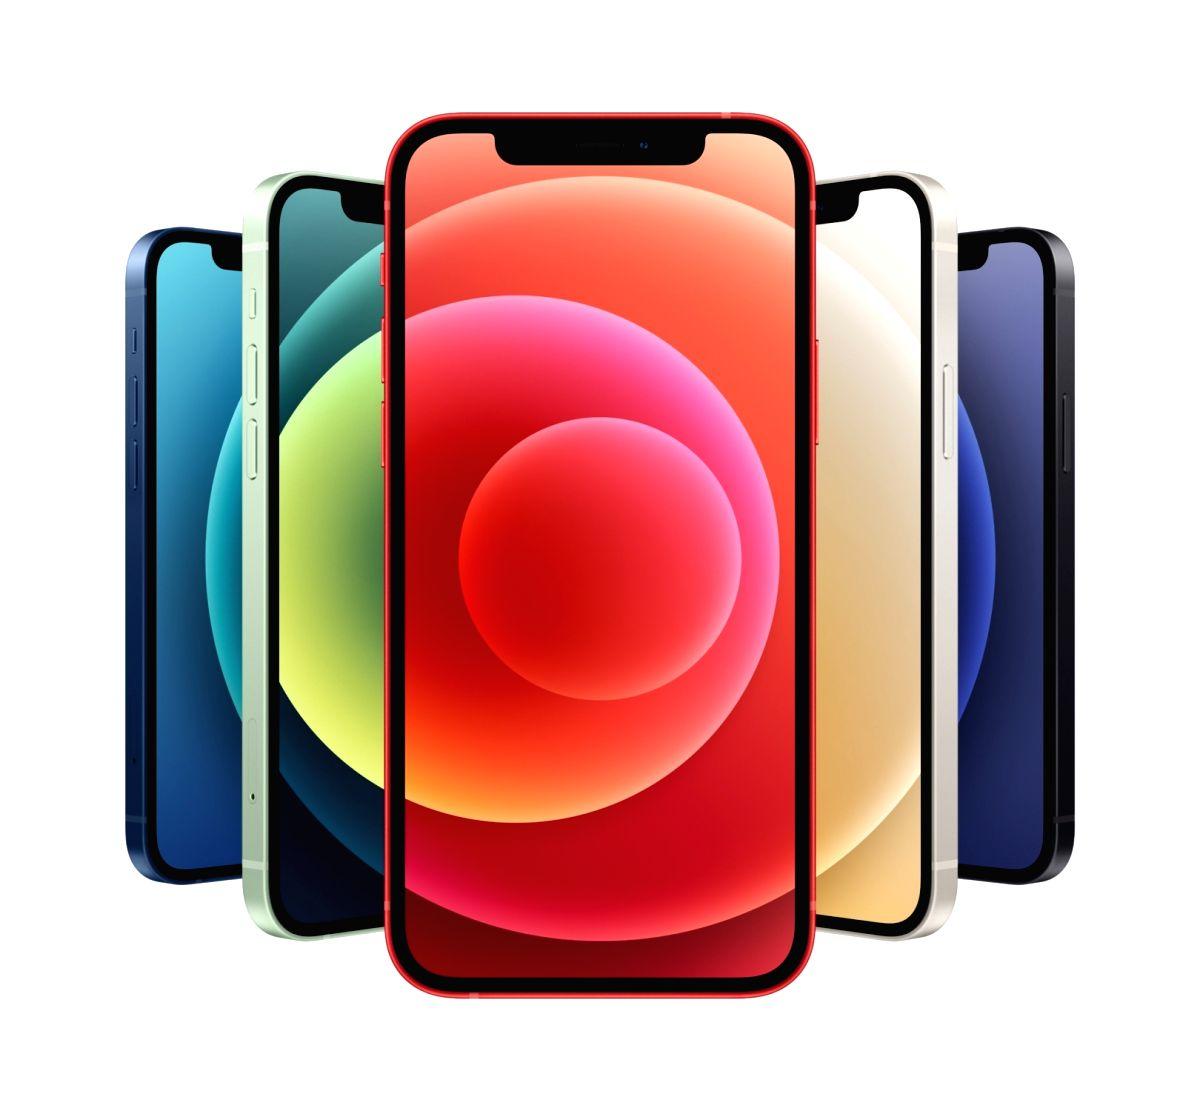 Apple enters 5G era with 4 iPhone 12 series smartphones.